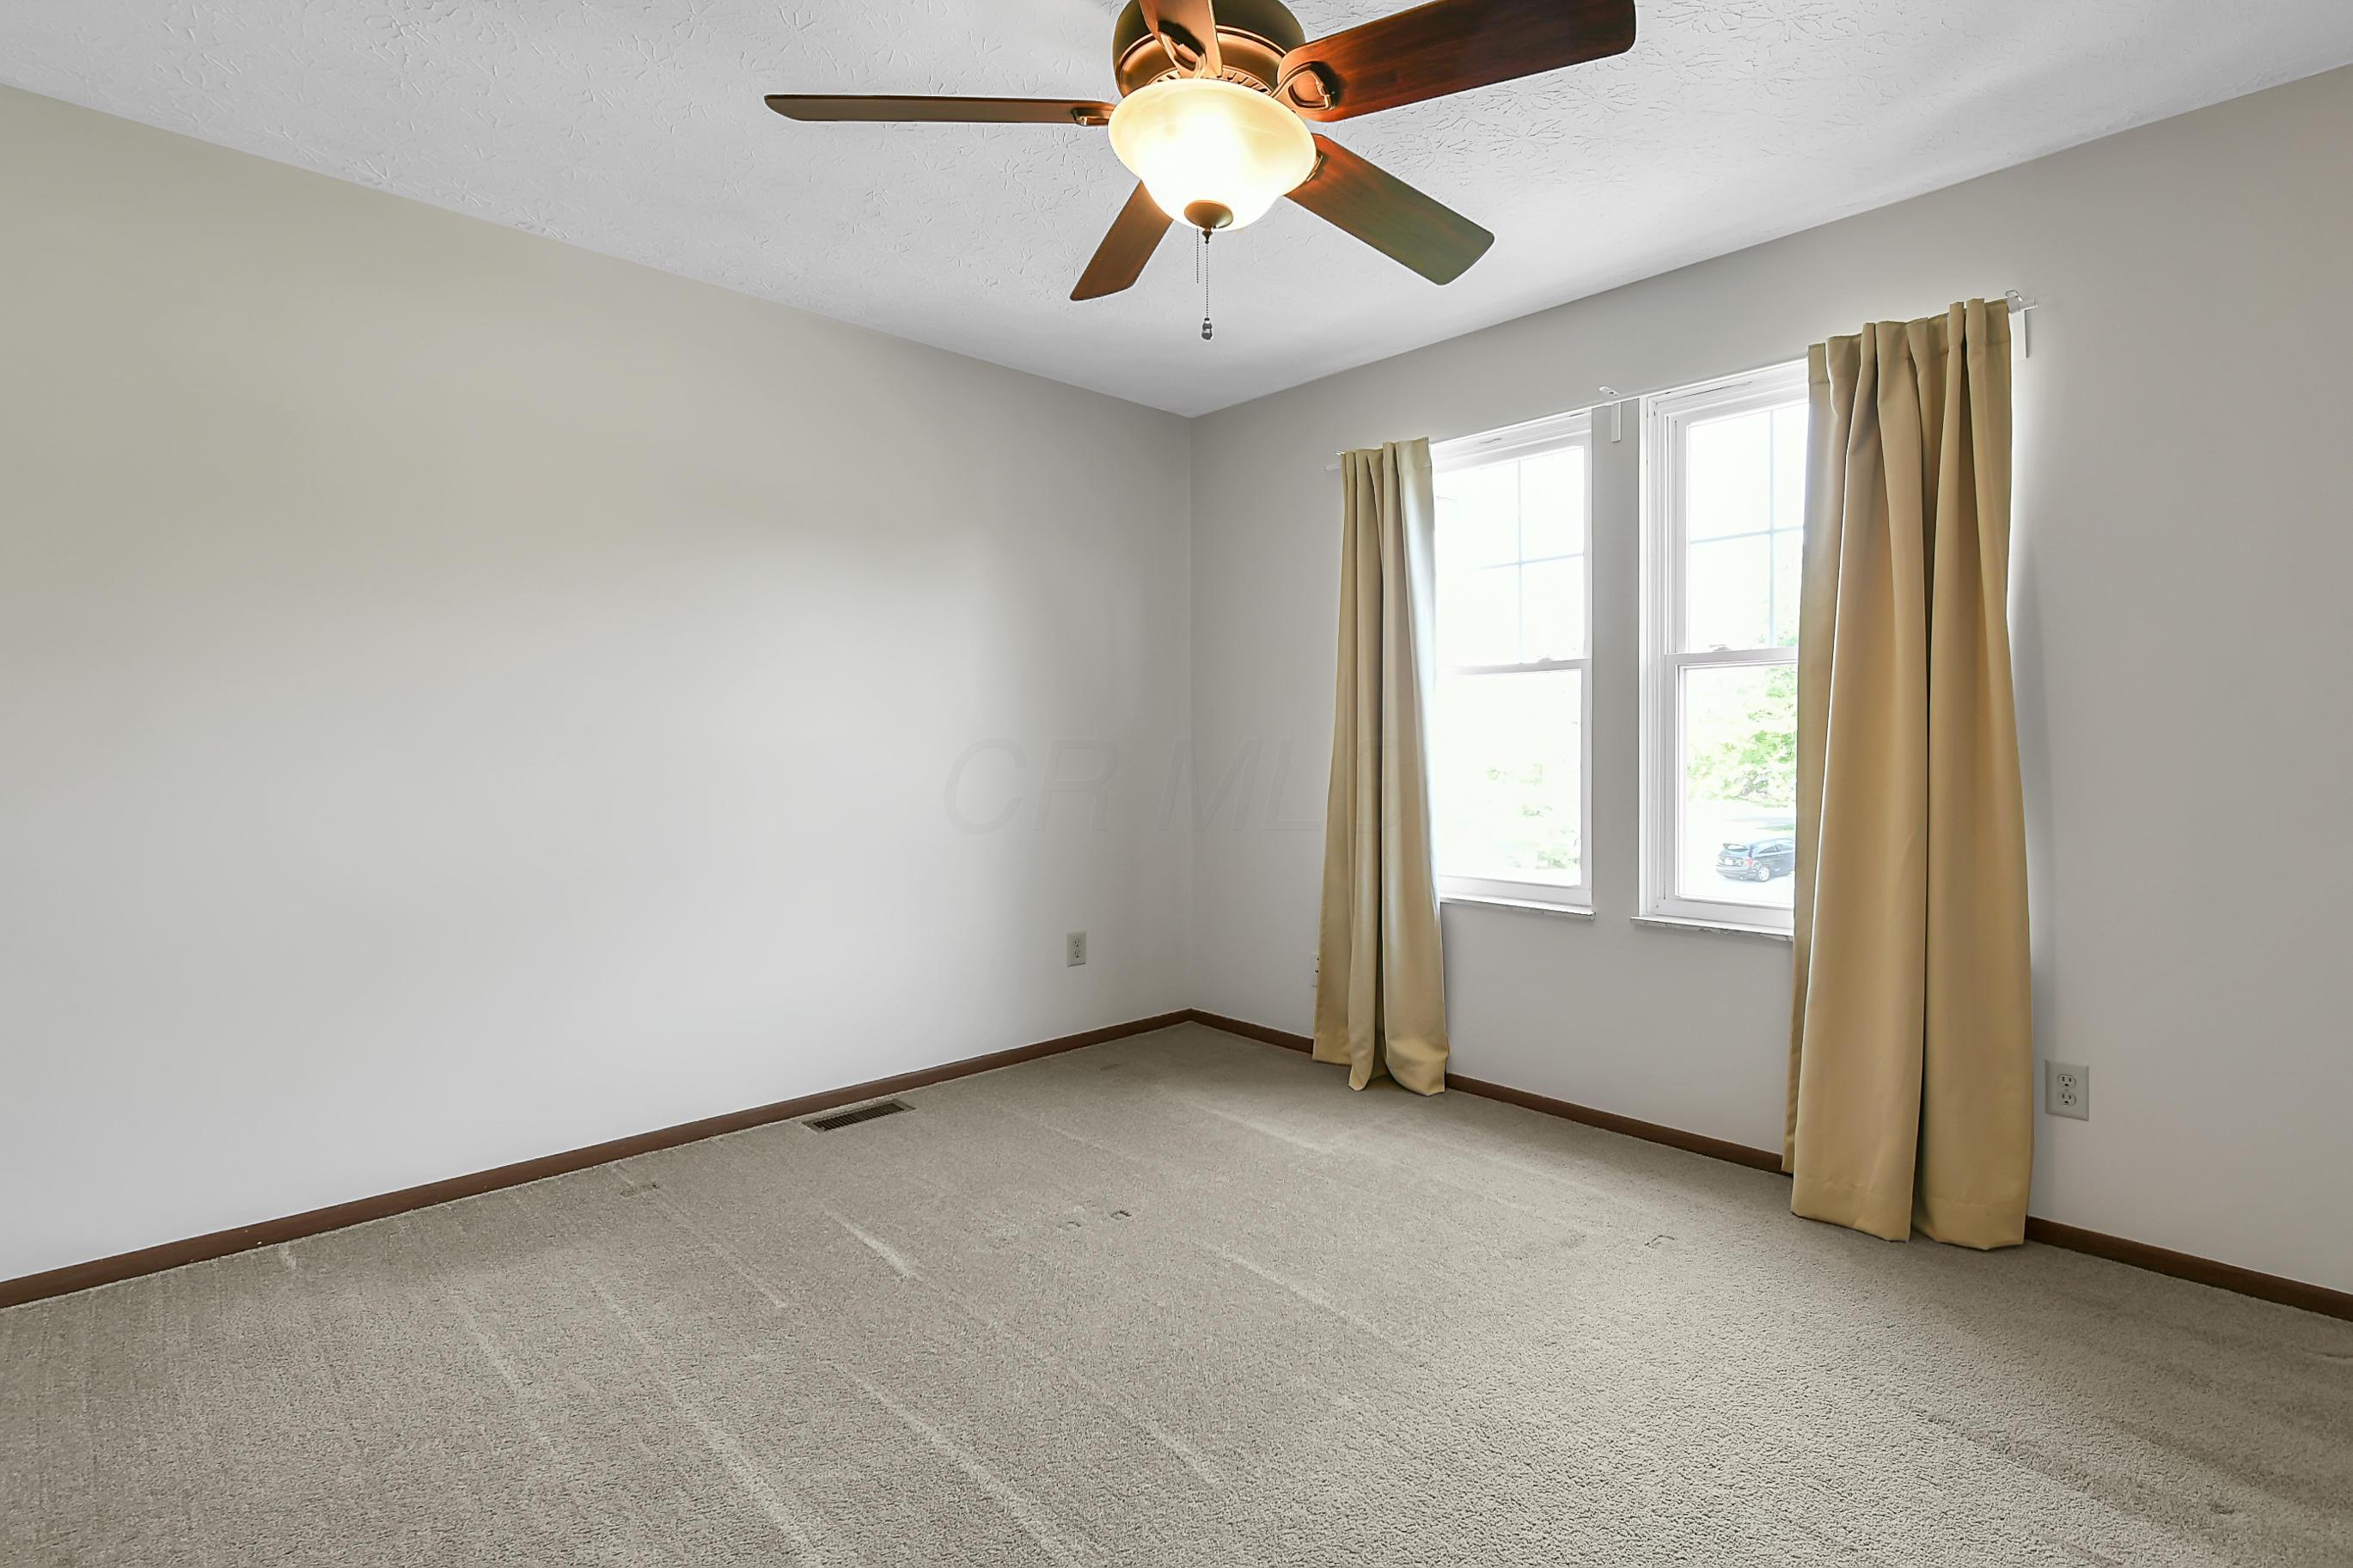 7606 Exploration Drive, Worthington, Ohio 43085, 2 Bedrooms Bedrooms, ,2 BathroomsBathrooms,Residential,For Sale,Exploration,220018471